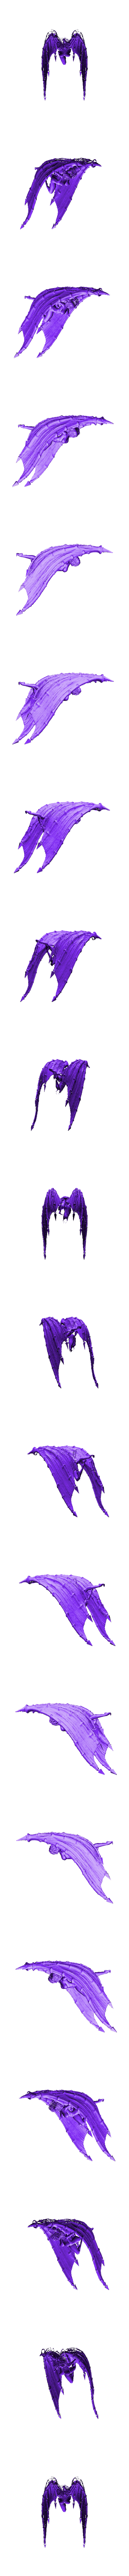 sexy_devil.stl Download free STL file Sexy Devil • 3D printing object, FiveNights